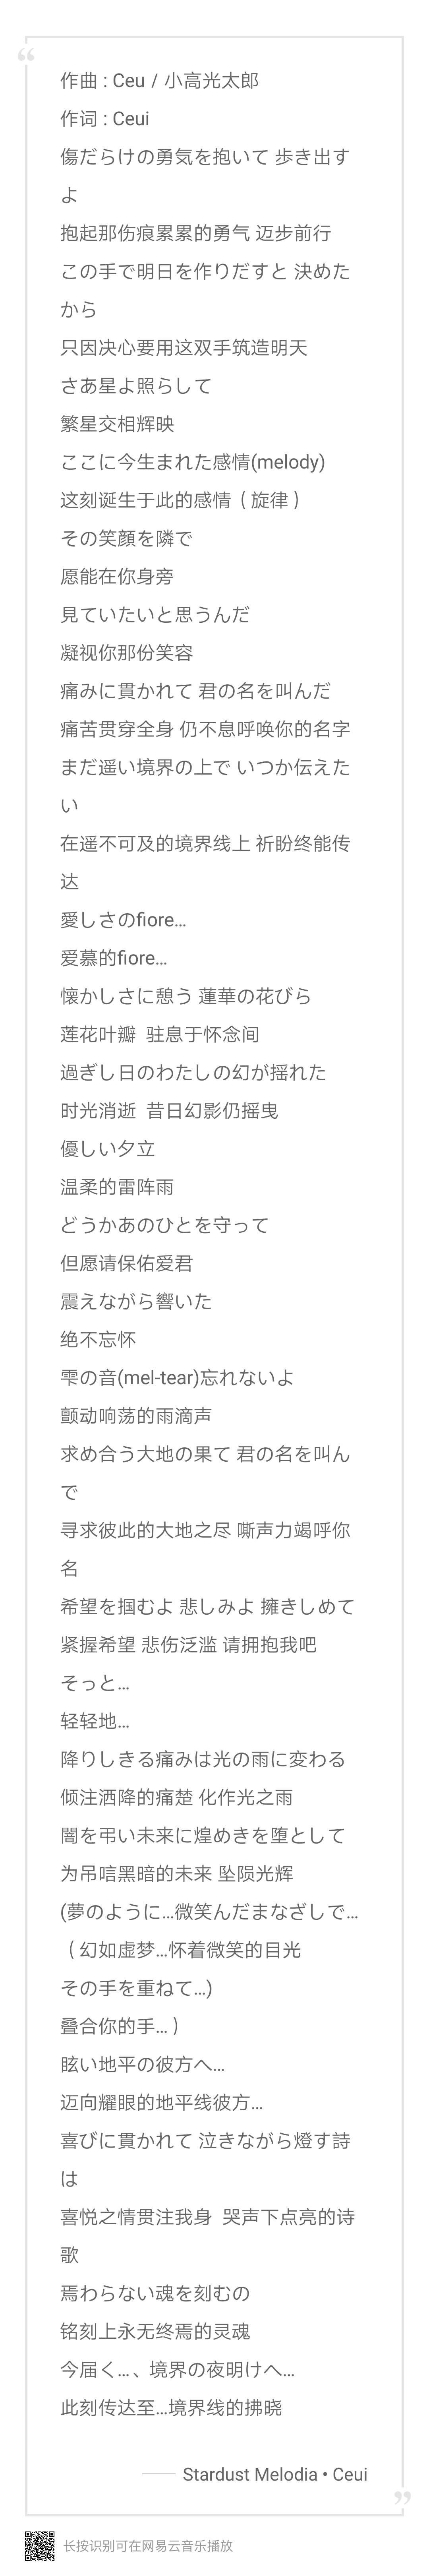 【音乐】Stardust Melodia